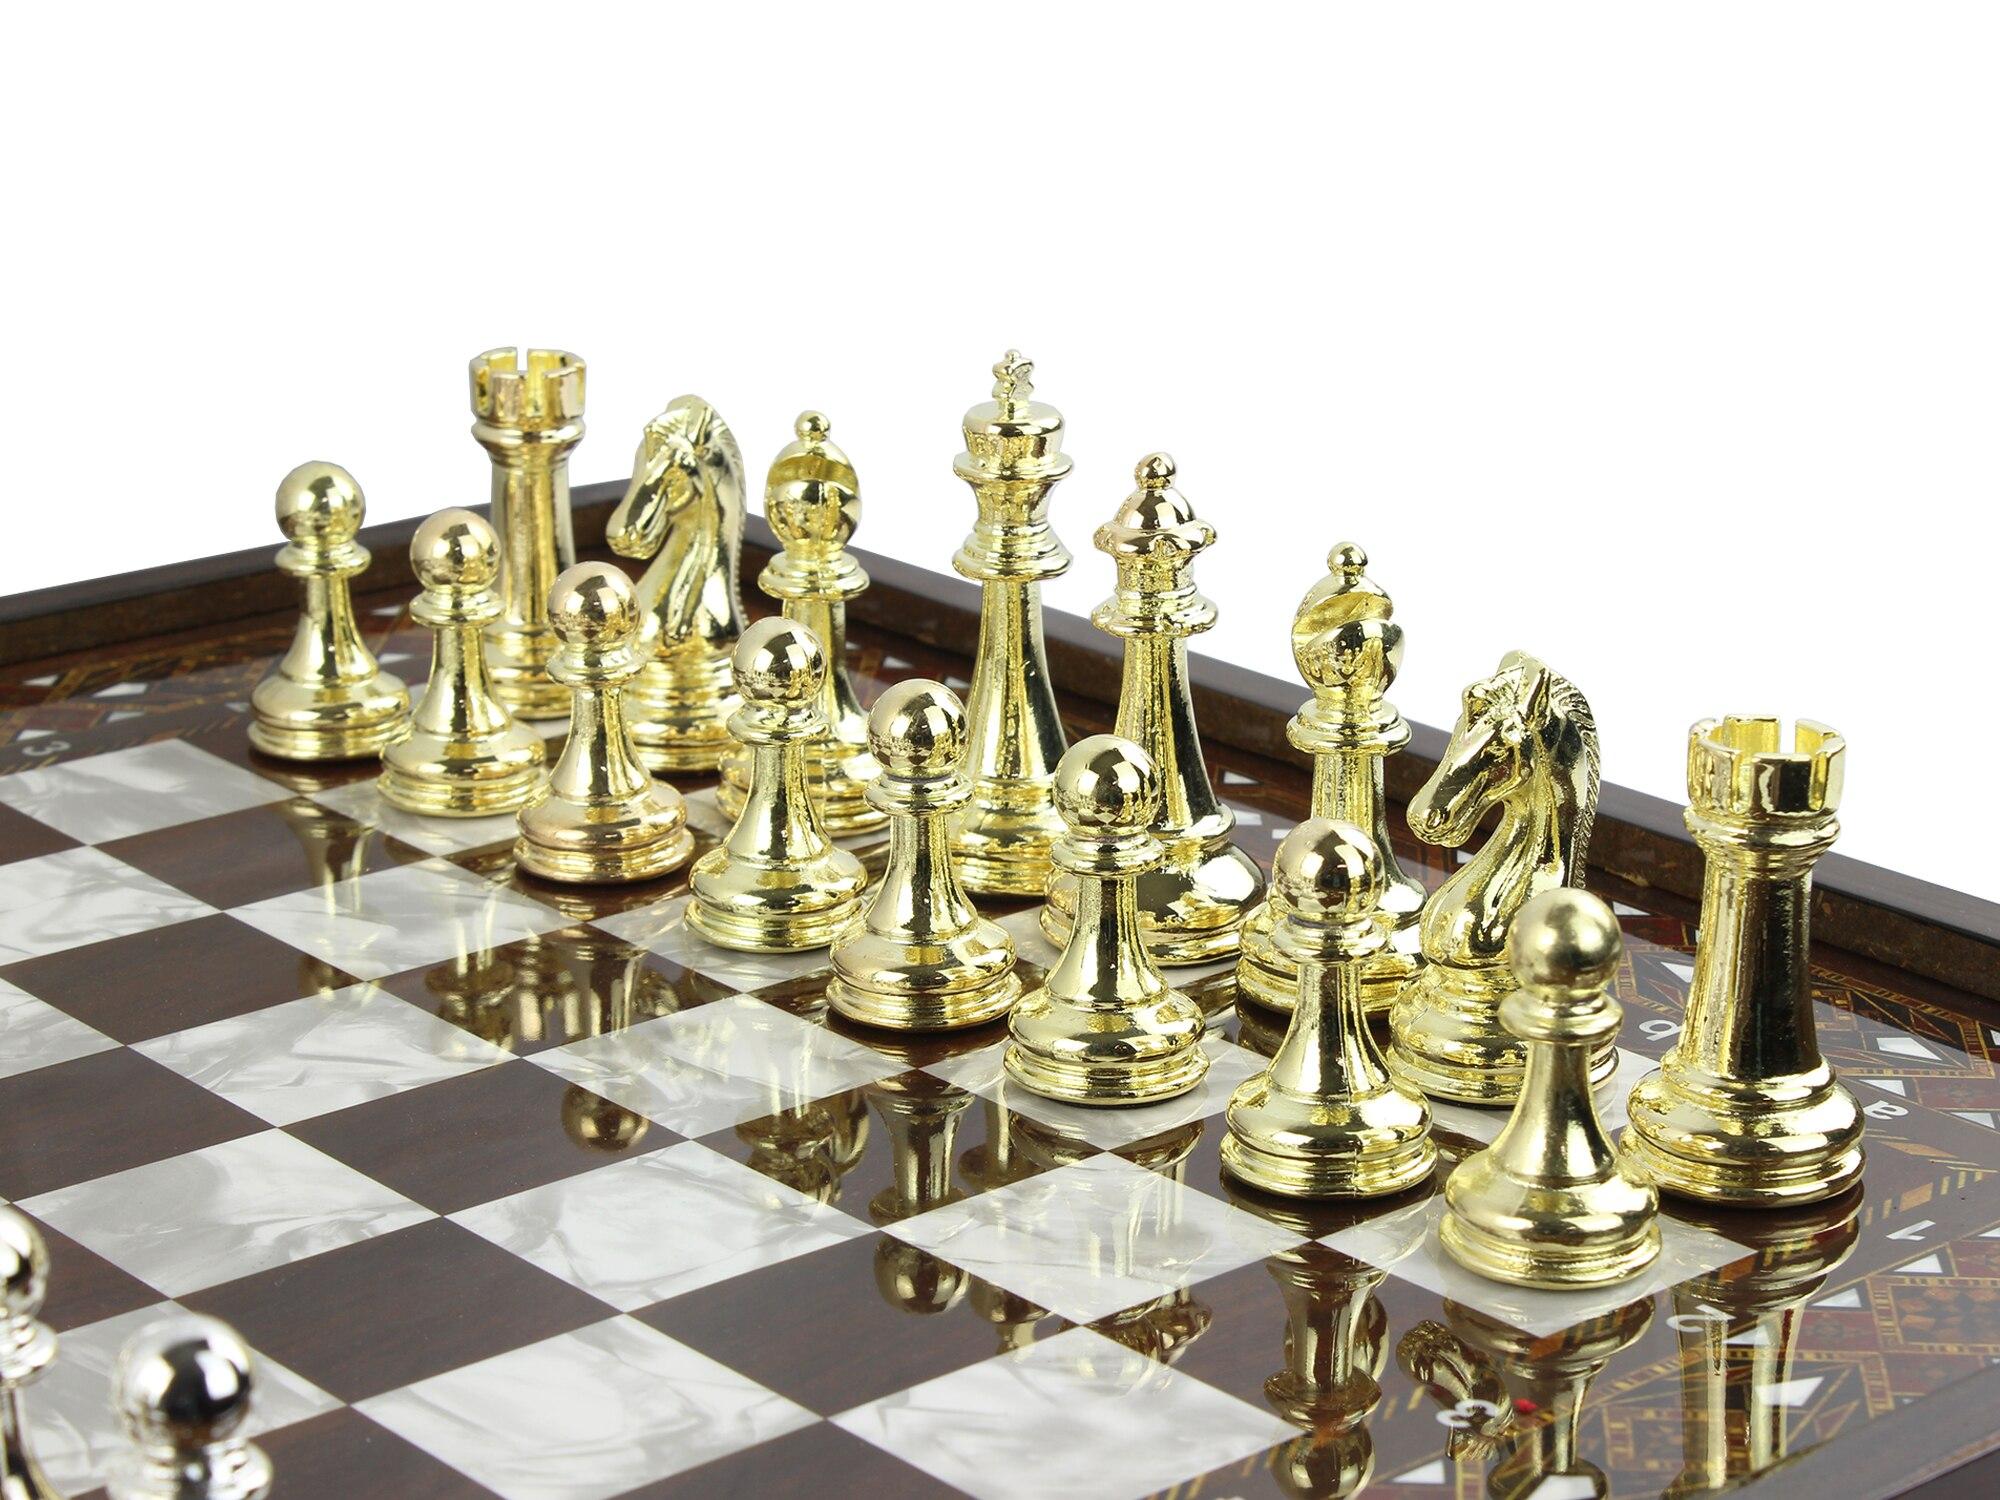 VIP لعبة الشطرنج متعدد الألوان العتيقة فسيفساء الشطرنج و الداما لعبة خشبية هدية الكريسماس للأم الداما هدية لصديقها